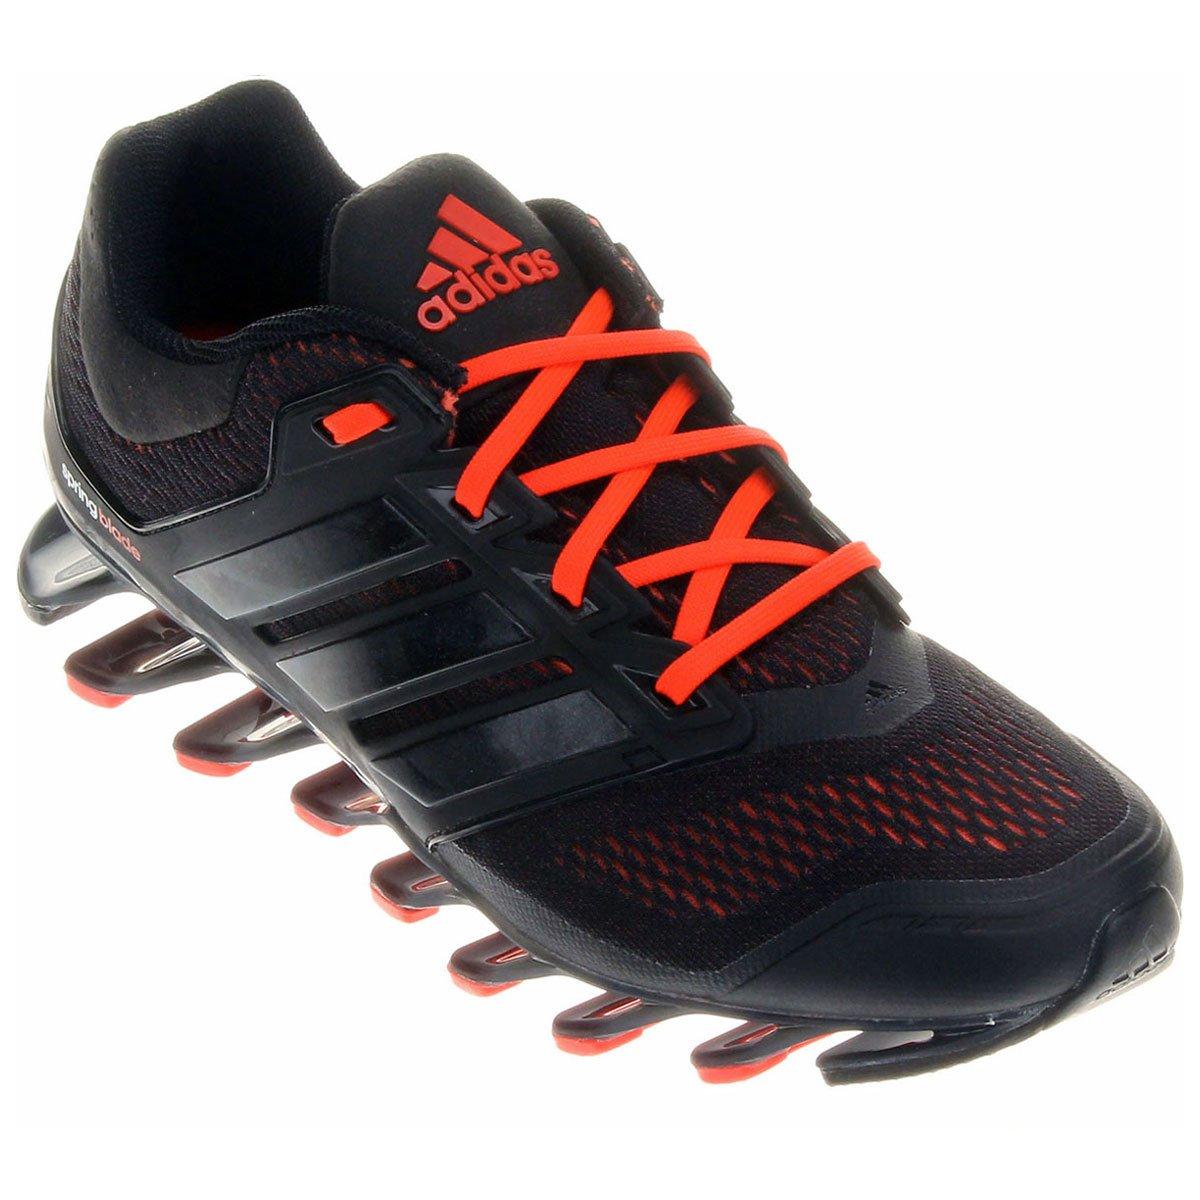 5246eae5007 discount code for tênis adidas springblade drive 3 laranja ecb5e dcd70   real tênis adidas springblade 2 masculino pretolaranja escuro 790ec 06a21